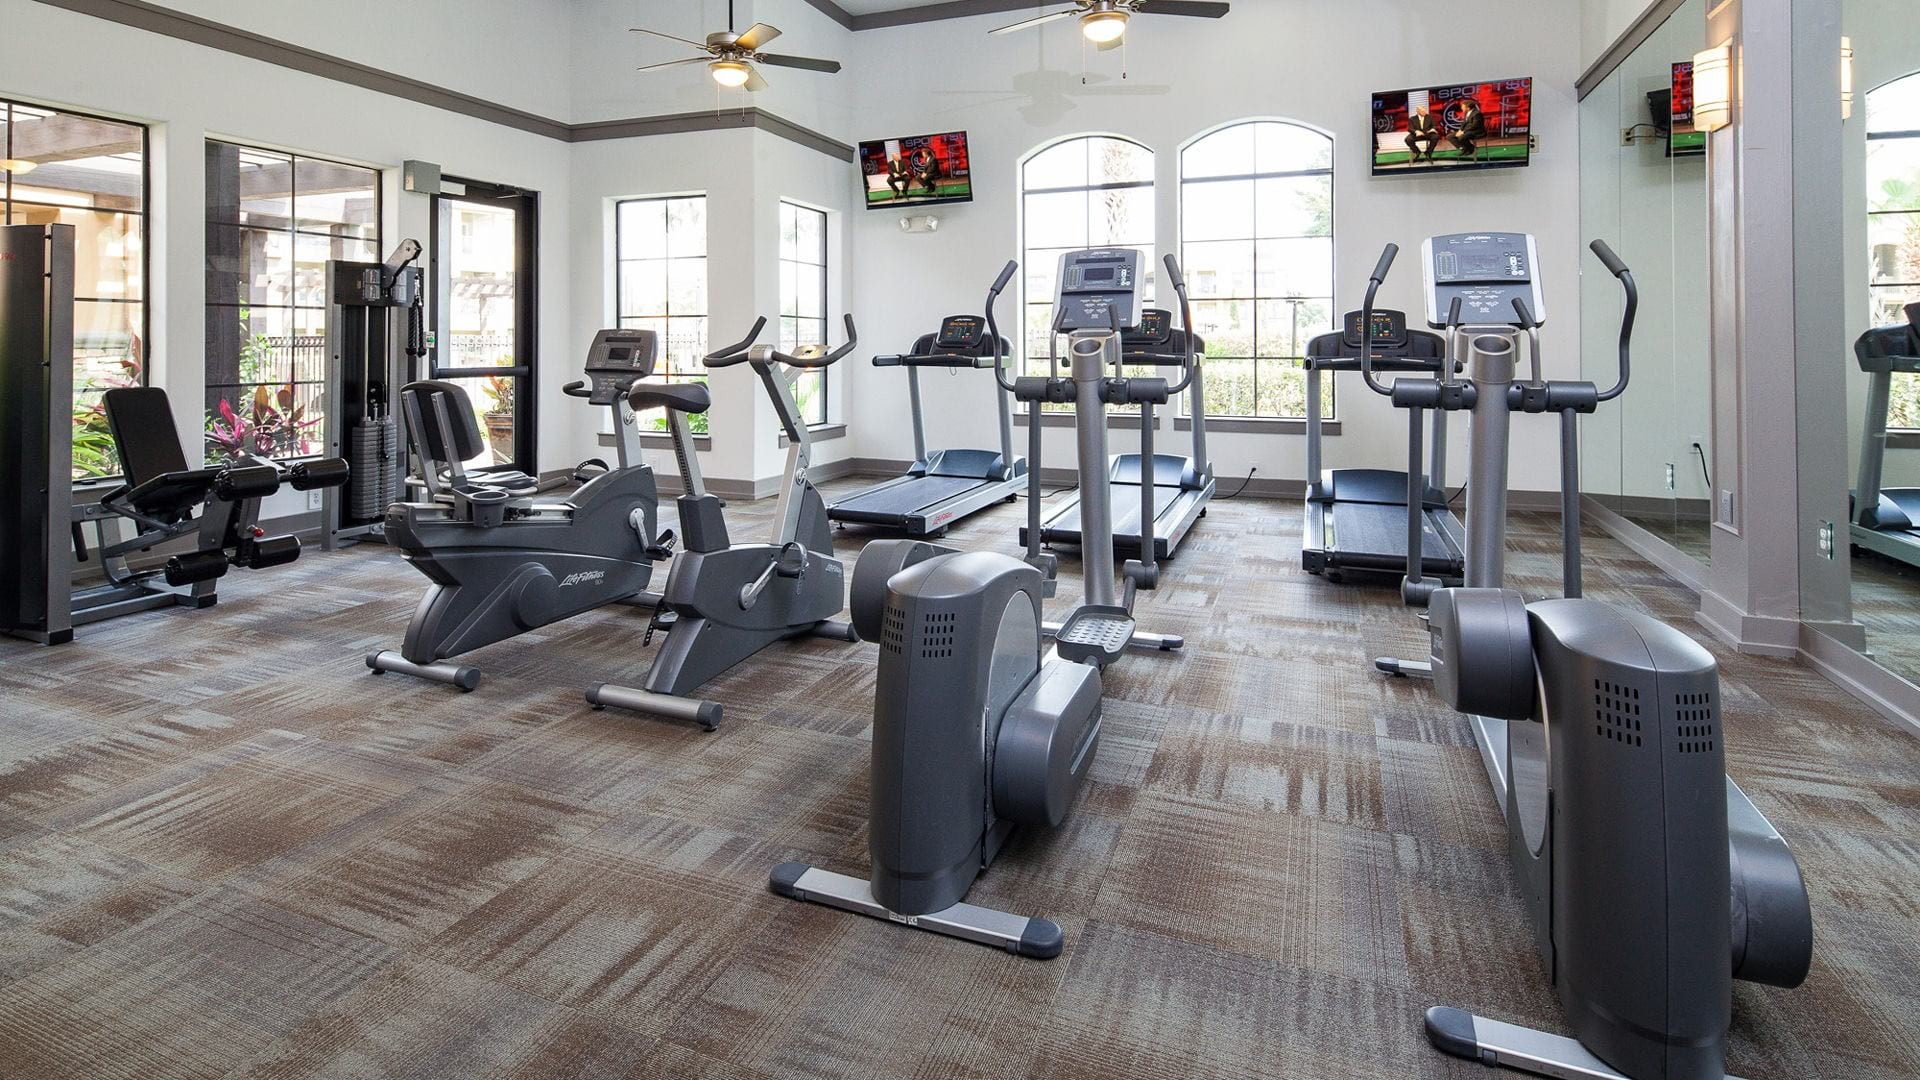 Houston apartments with gym at Cortland Vizcaya